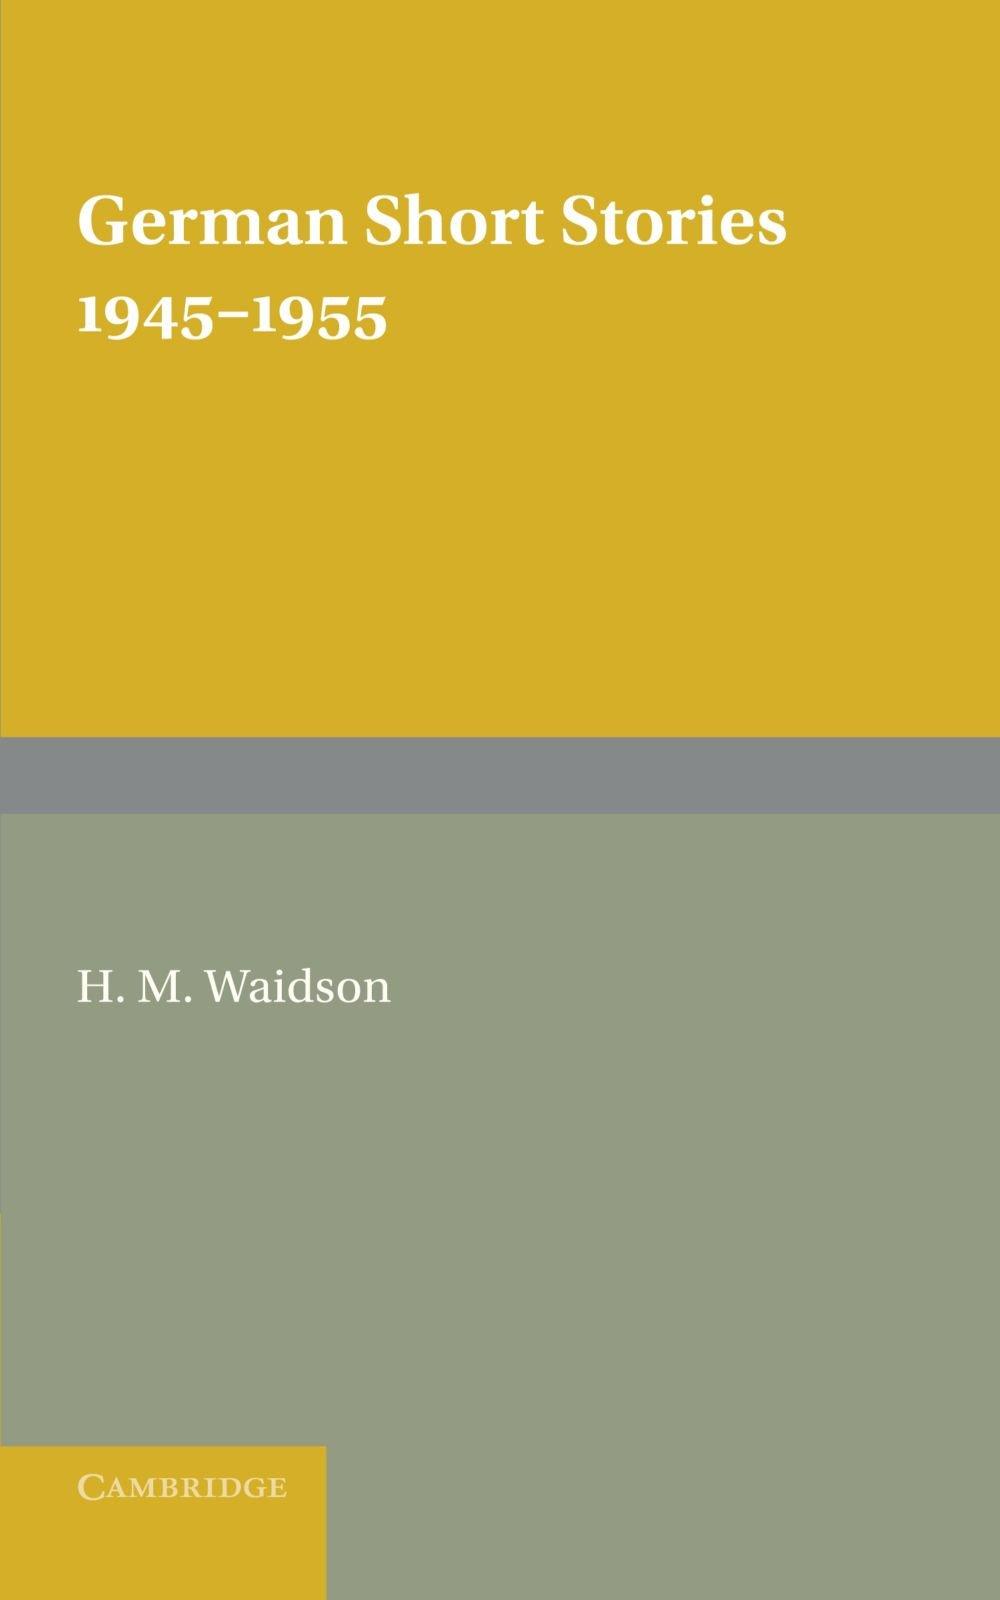 german-short-stories-1945-1955